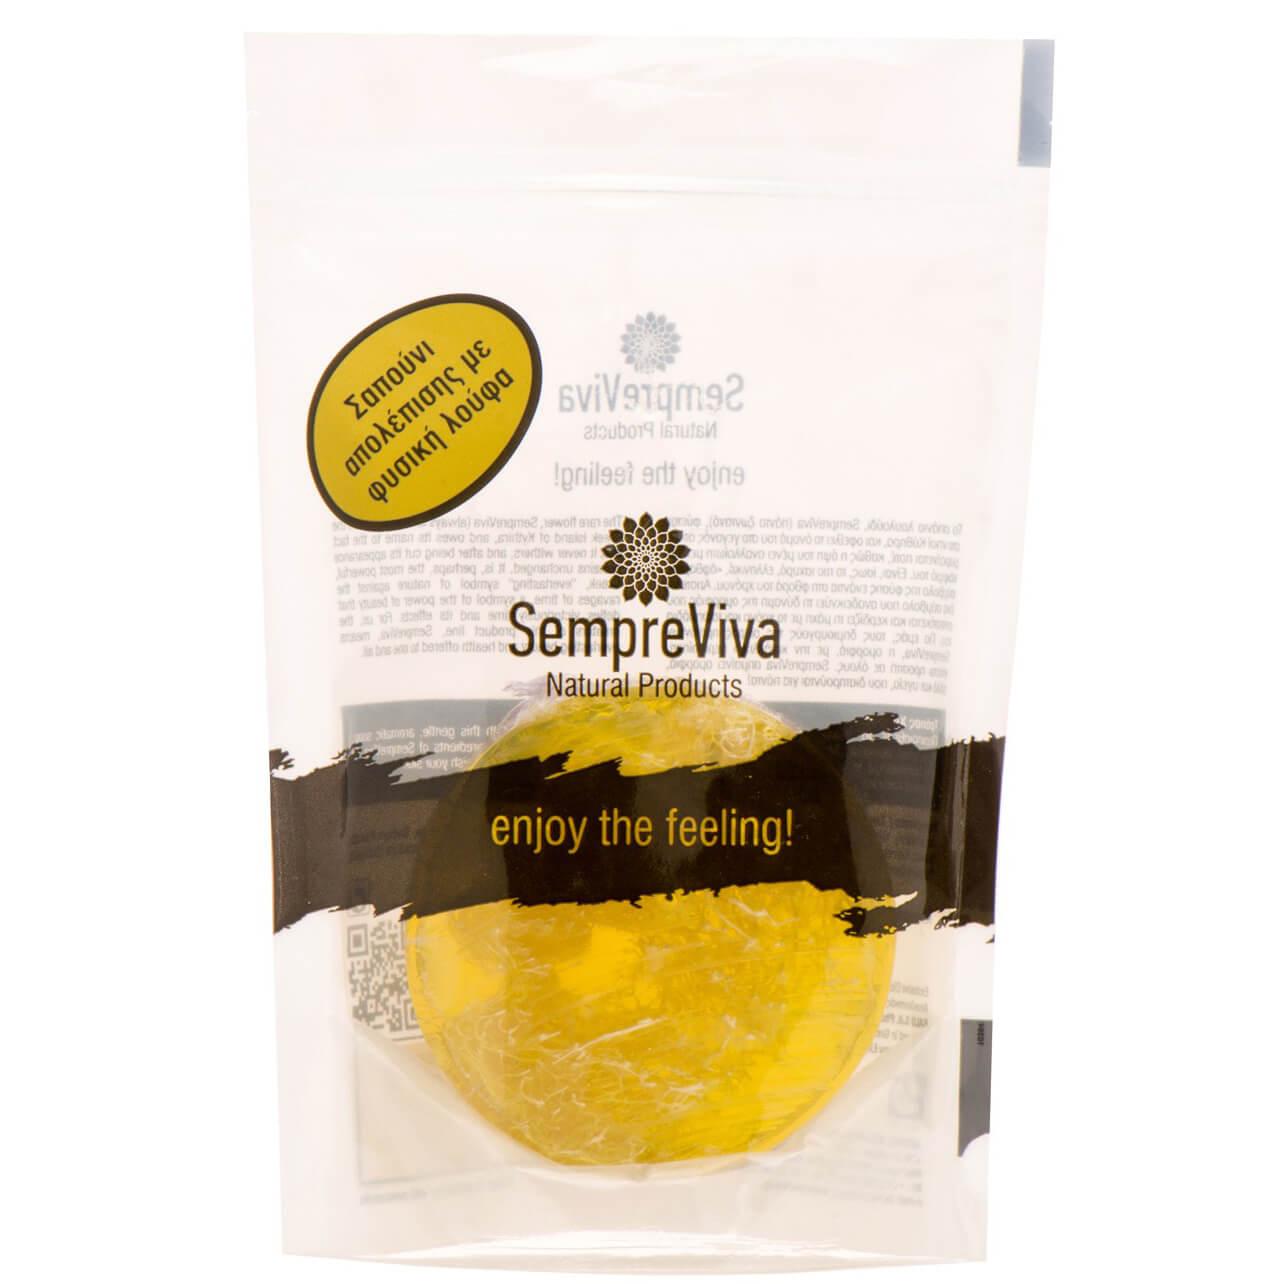 SempreViva Grape & Sponge Soap Σαπούνι Απολέπισης Σταφύλι με Φυσική Λούφα 120gr